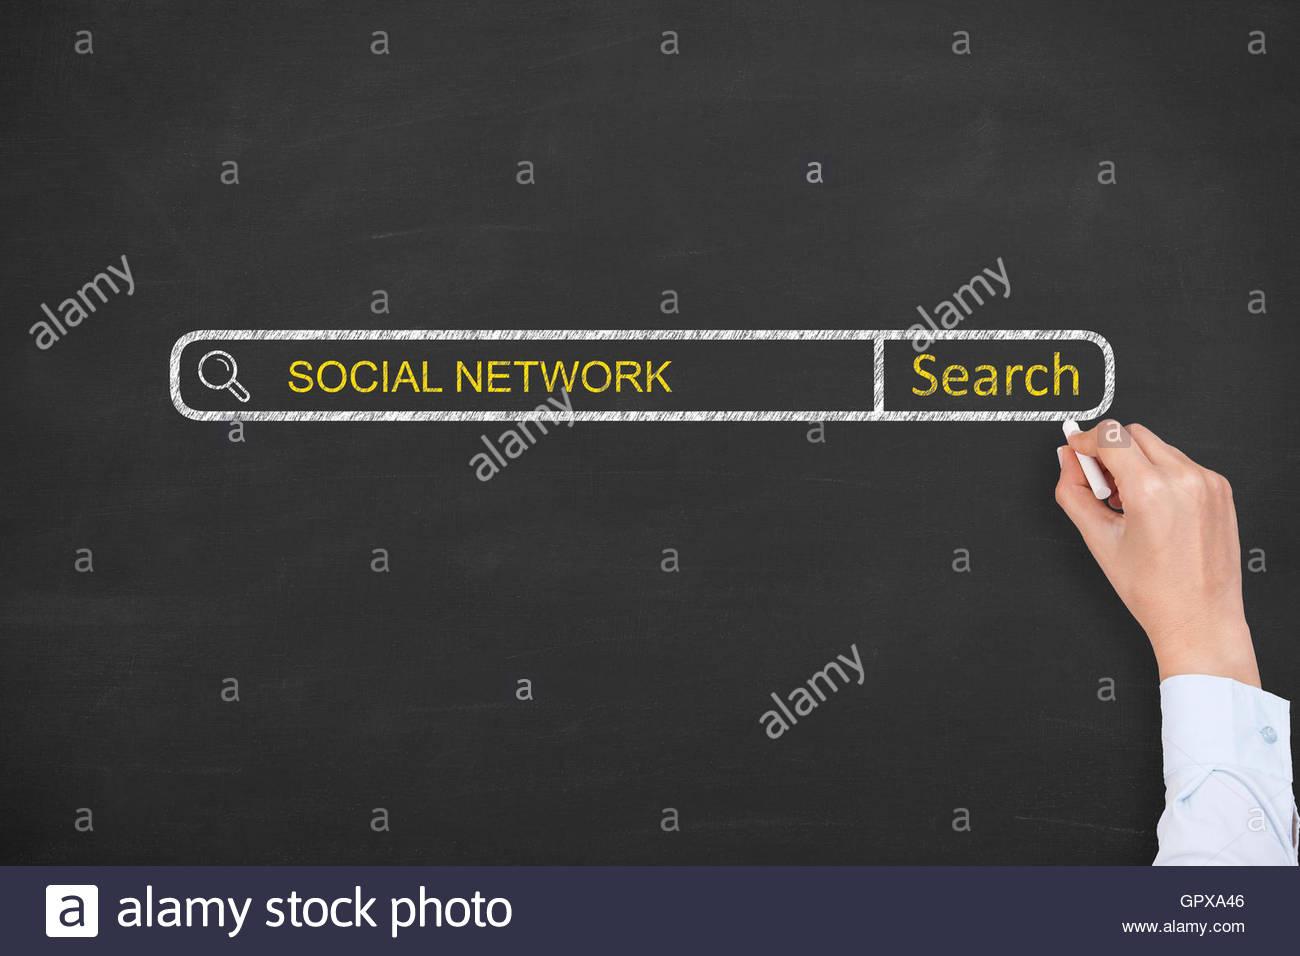 Social Network Search Engine on Blackboard Stock Photo